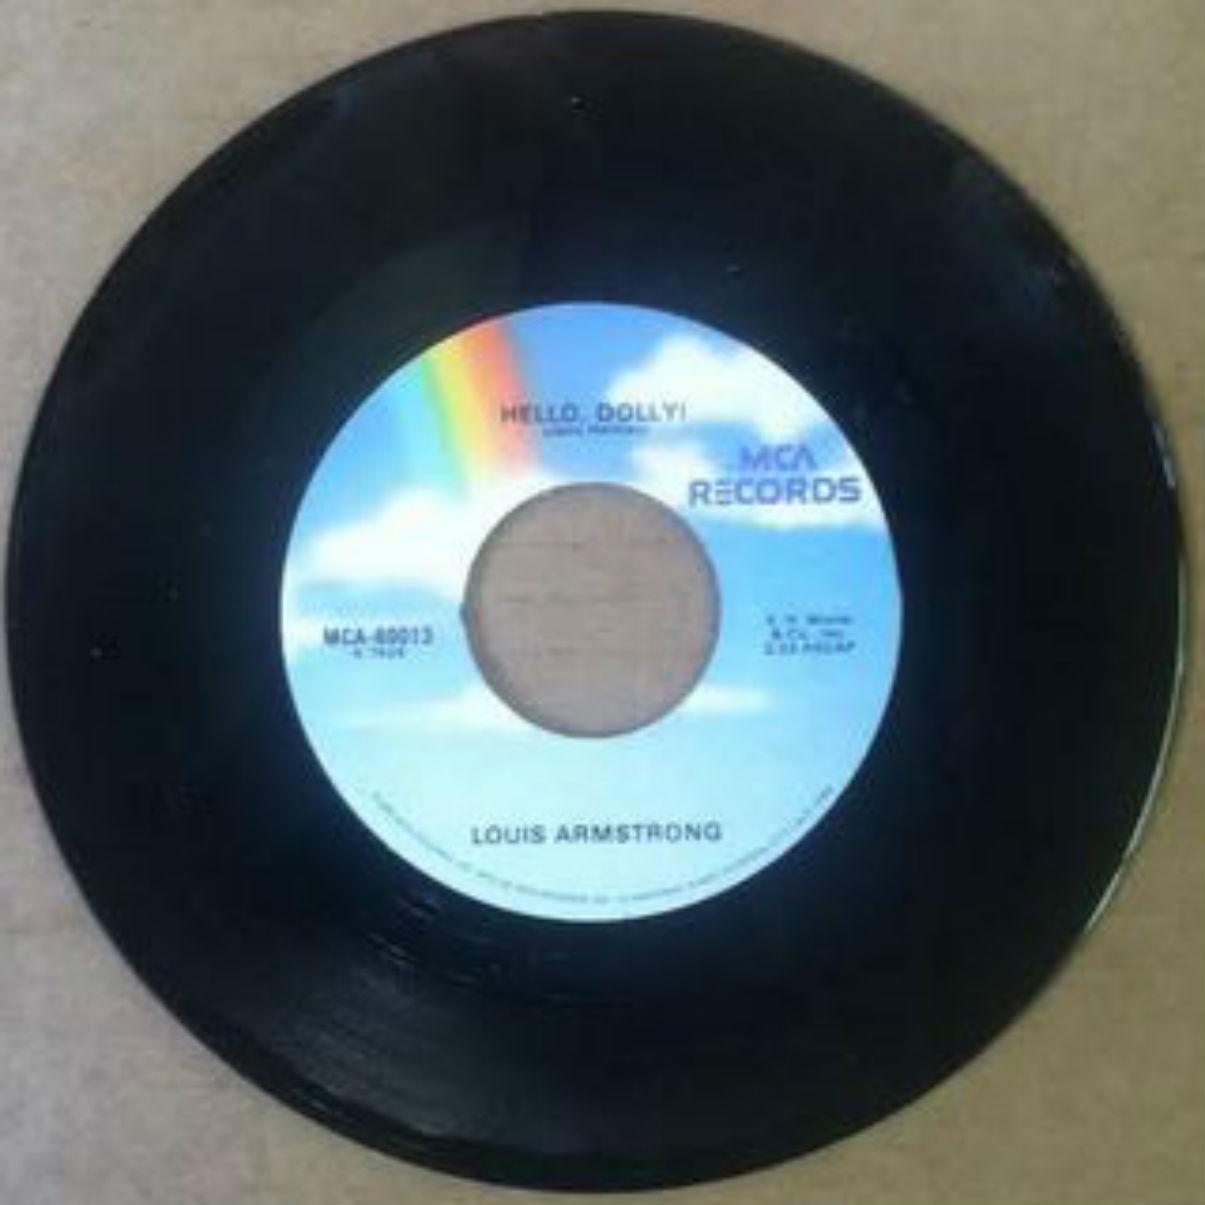 Louis Armstrong / Hello, Dolly